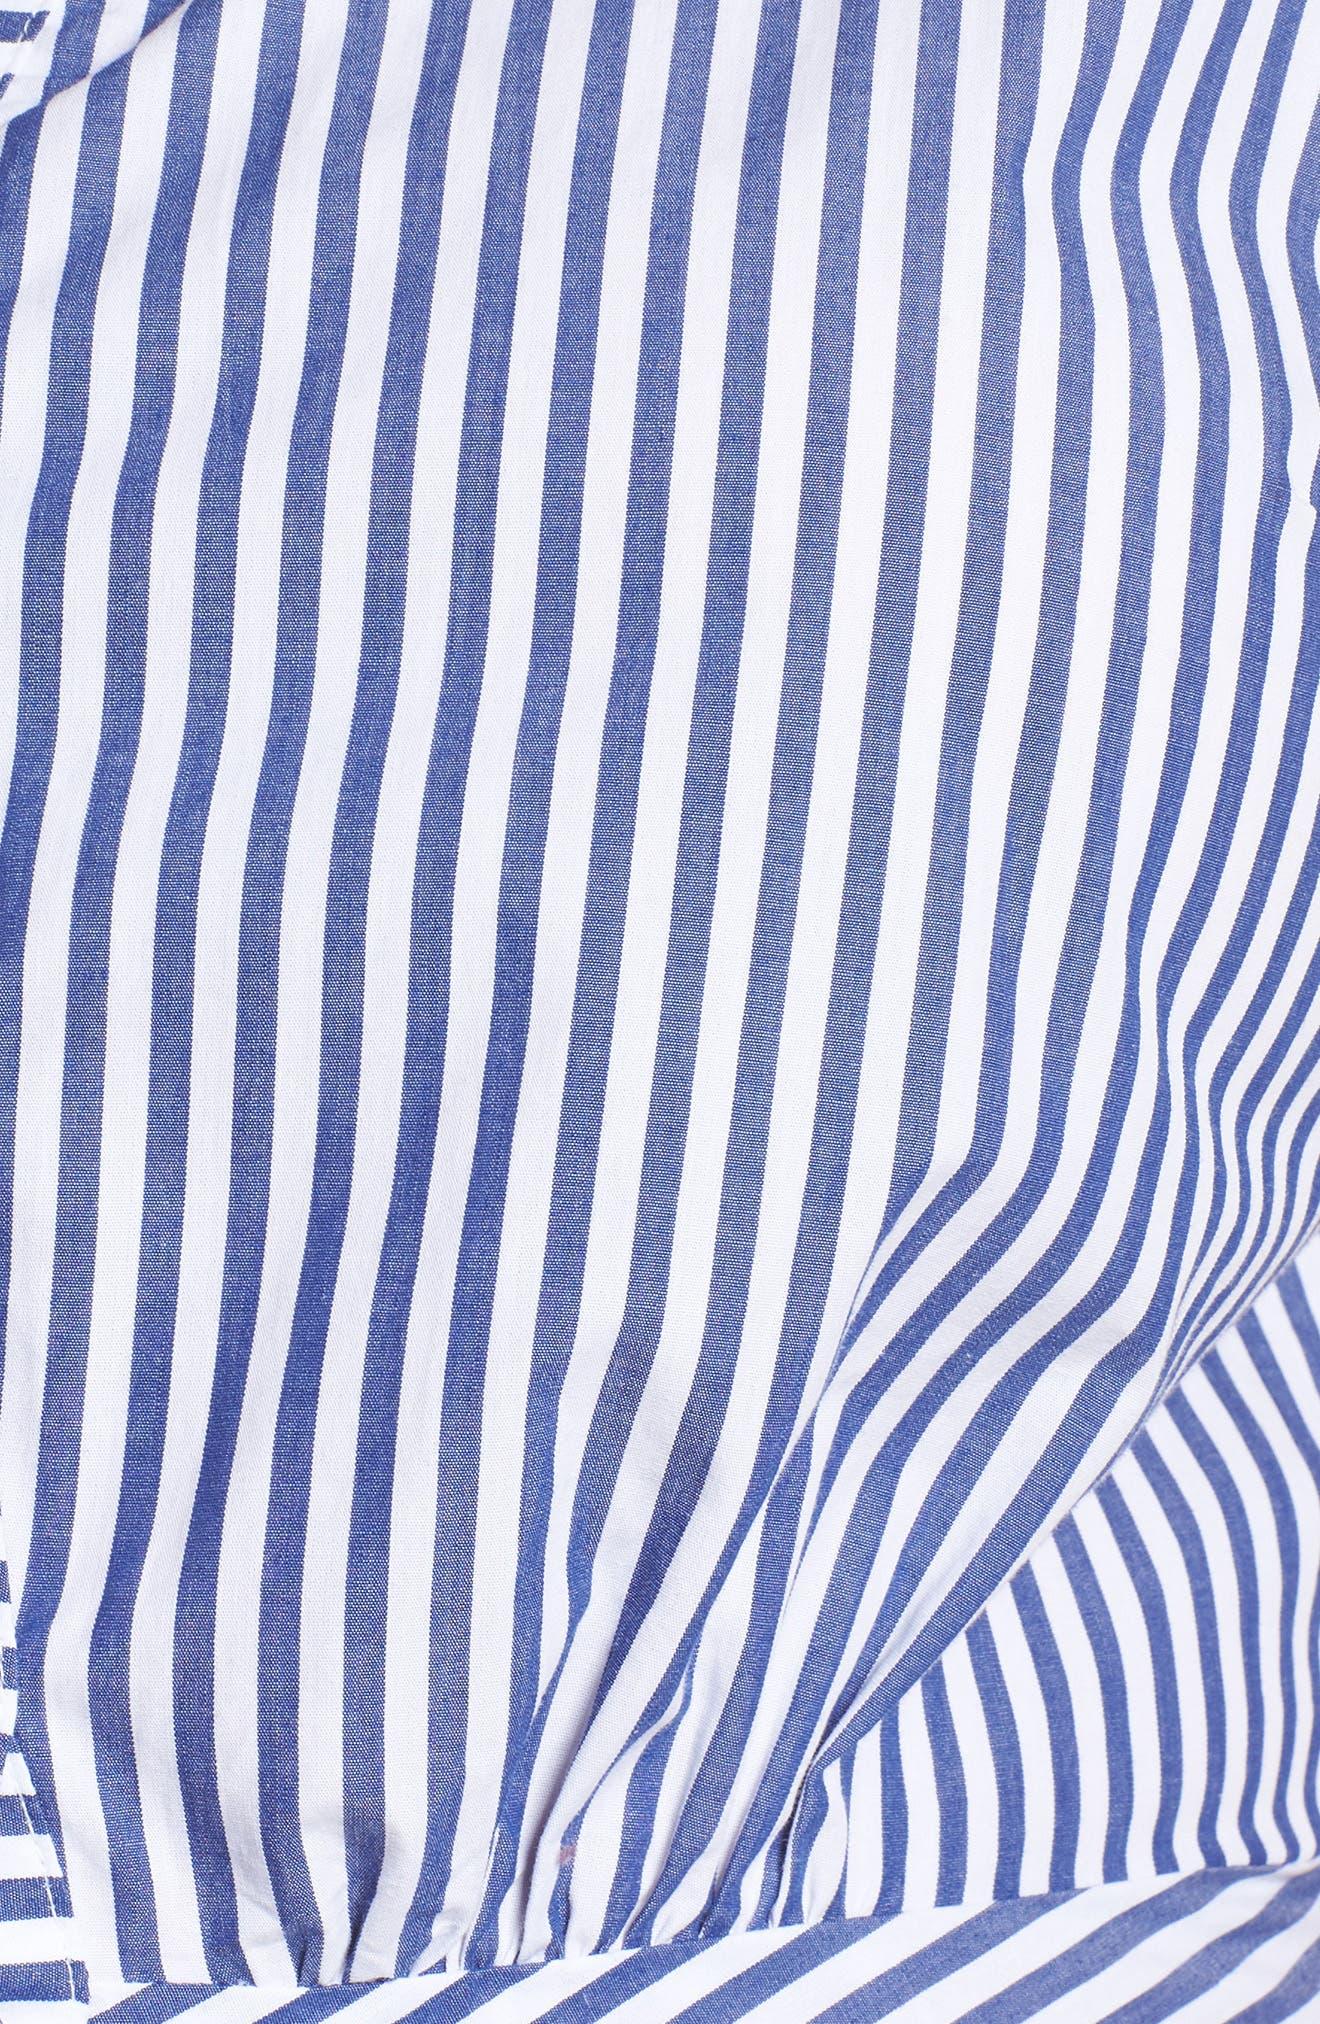 Stripe Ruched Cotton Shirtdress,                             Alternate thumbnail 8, color,                             Blue White Stripe